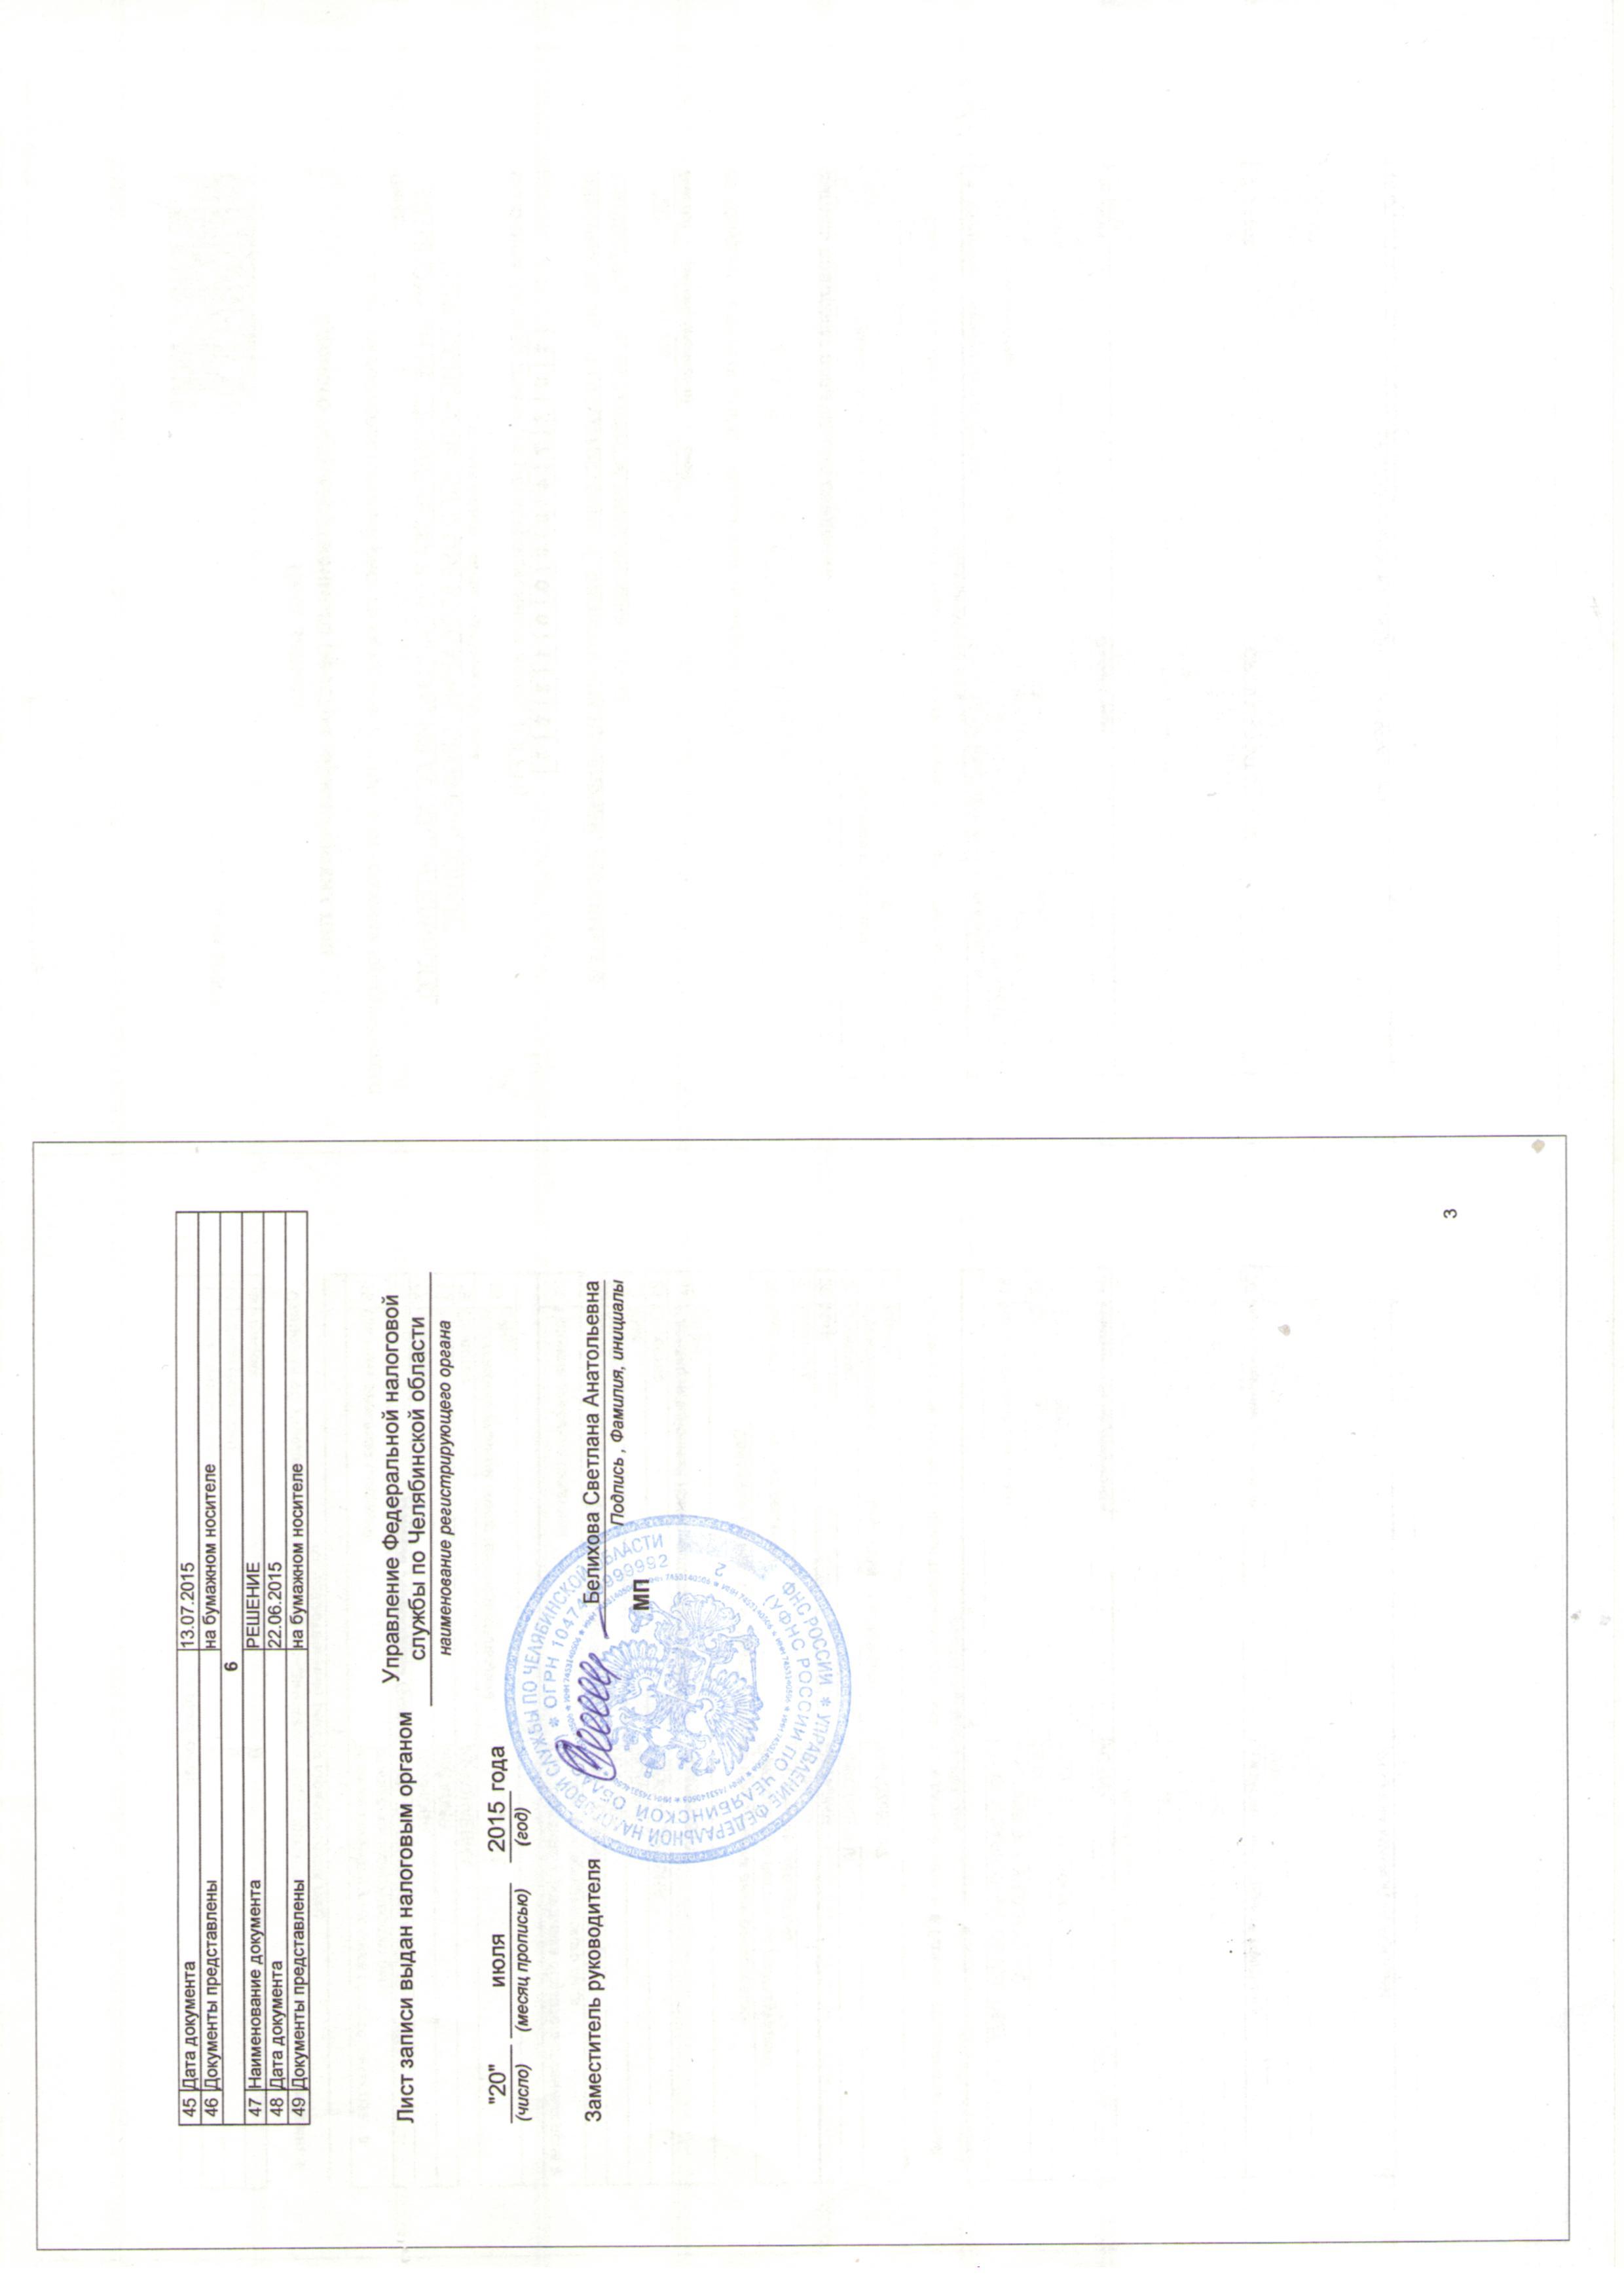 Лист записи ЕГРЮЛ 2015 (2).jpg